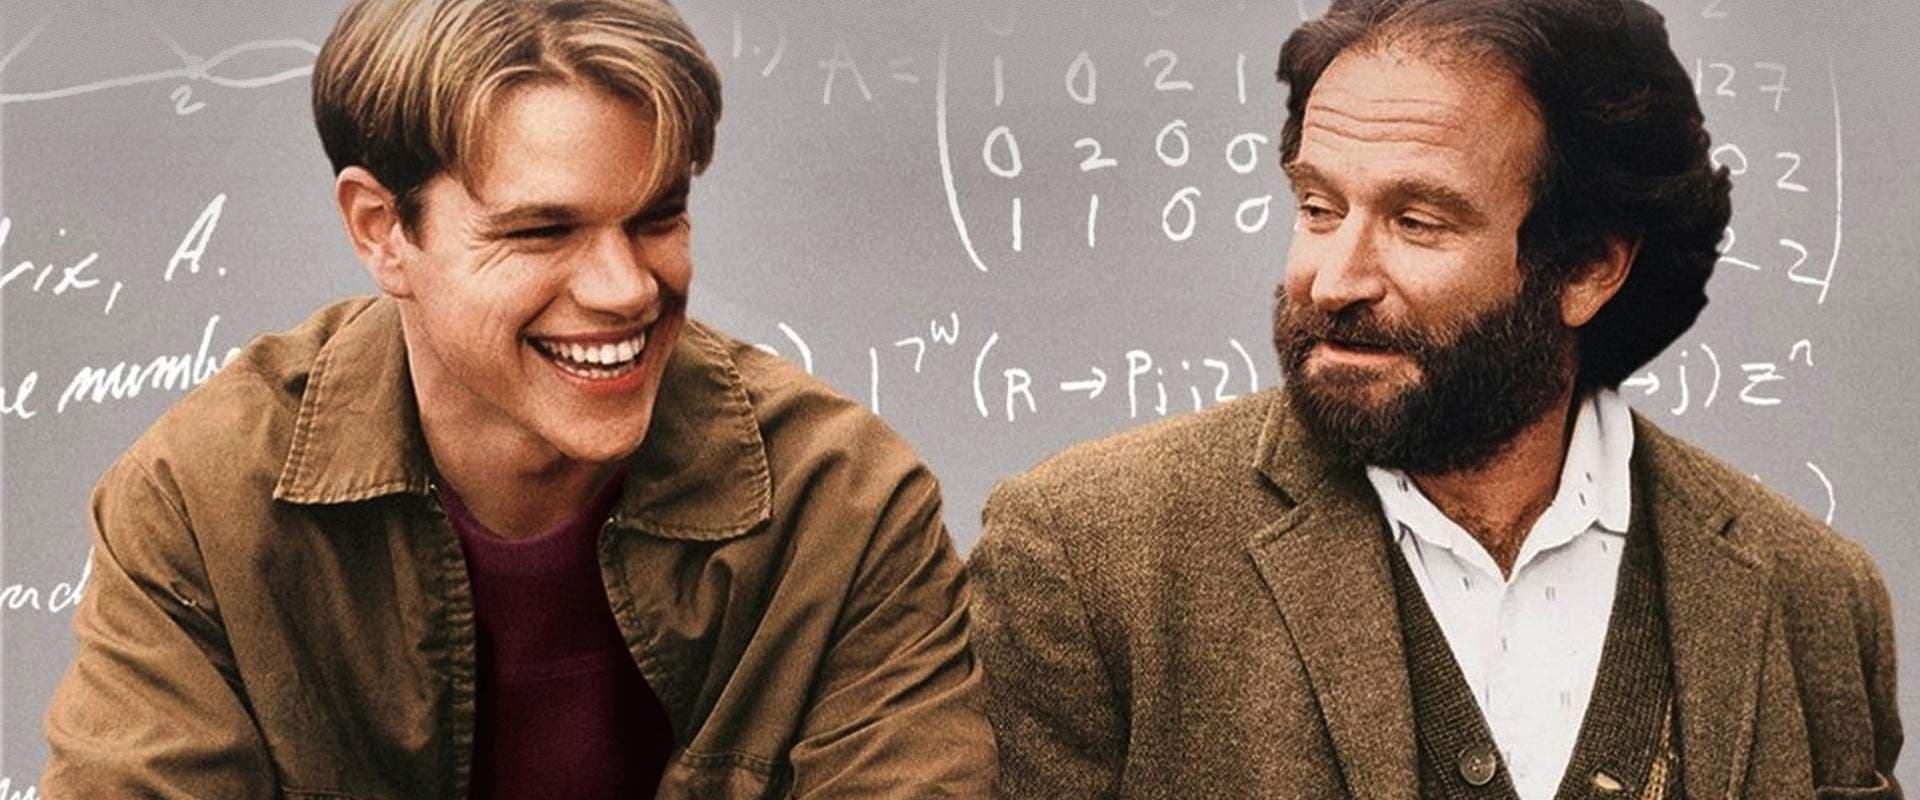 Good Will Hunting 123Movies Watch Full Movie Online Stream